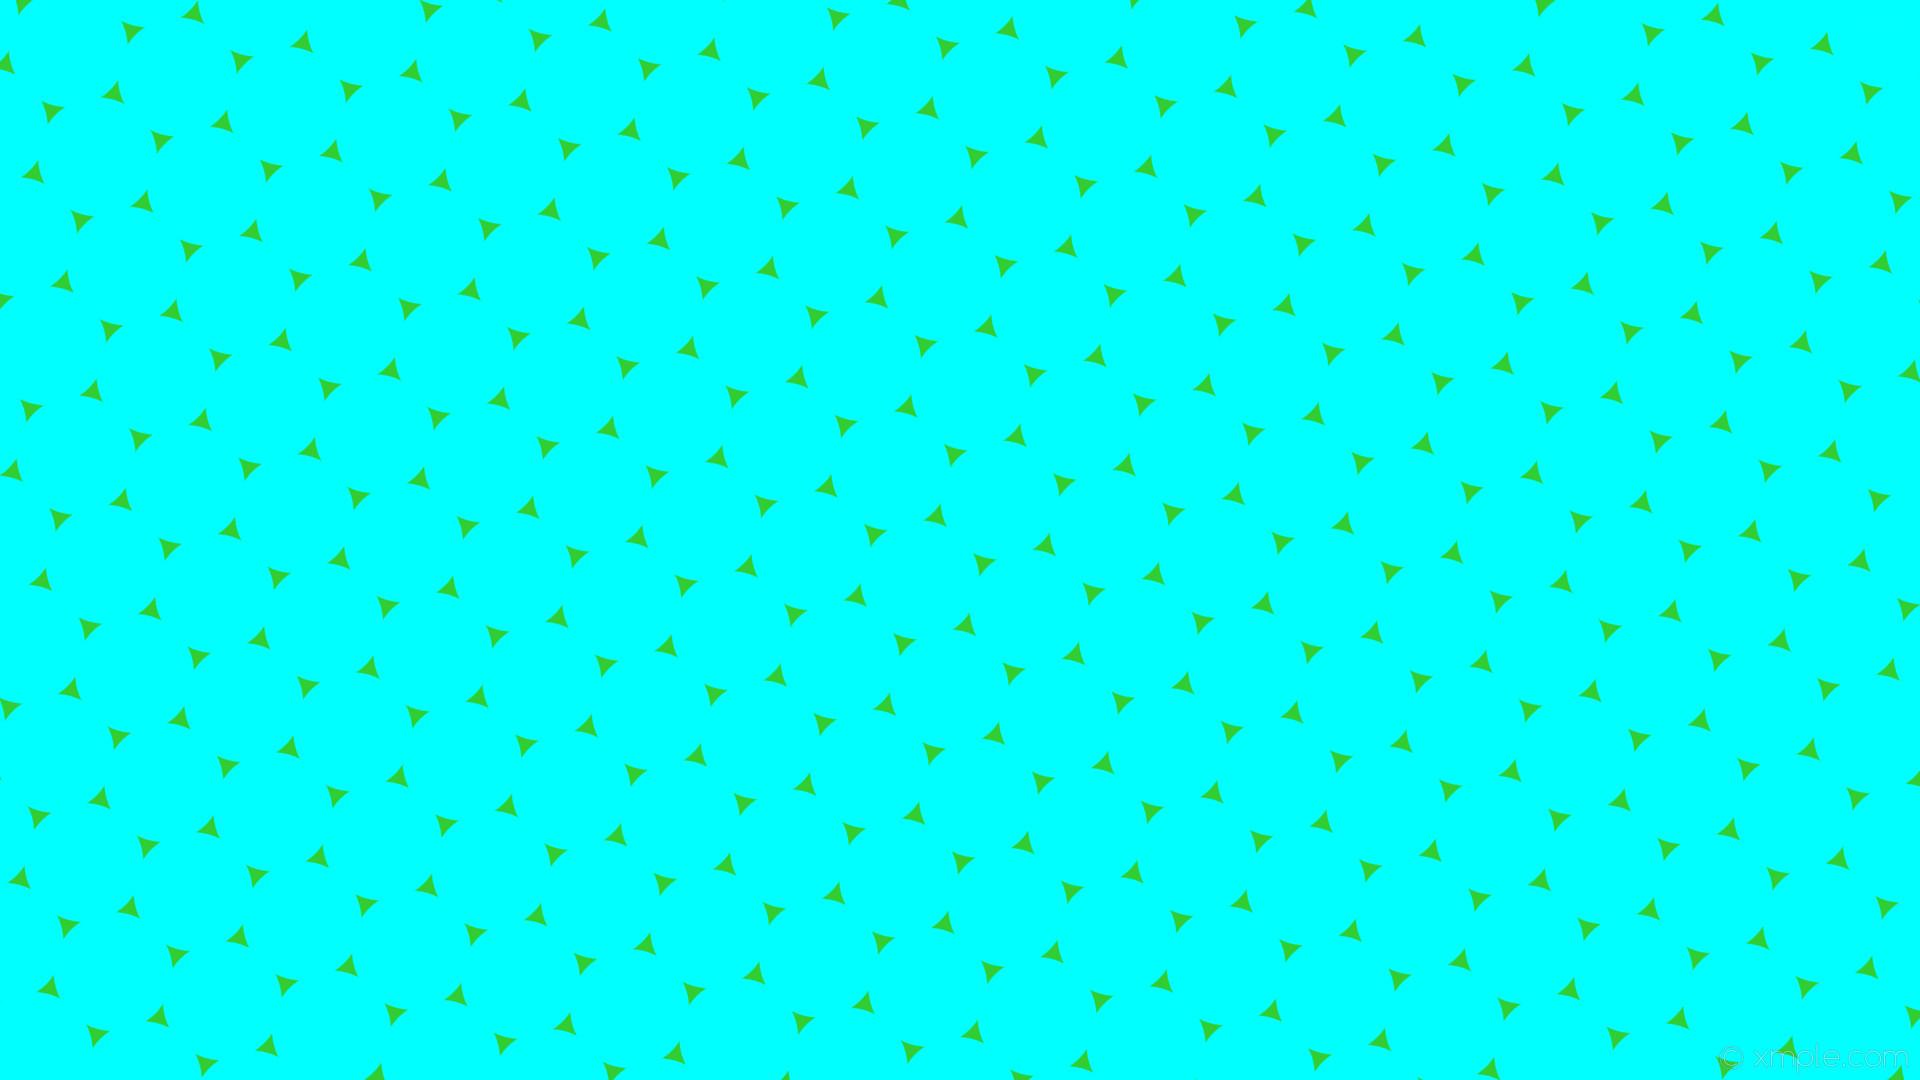 wallpaper polka blue hexagon dots green lime green aqua cyan #32cd32  #00ffff diagonal 45